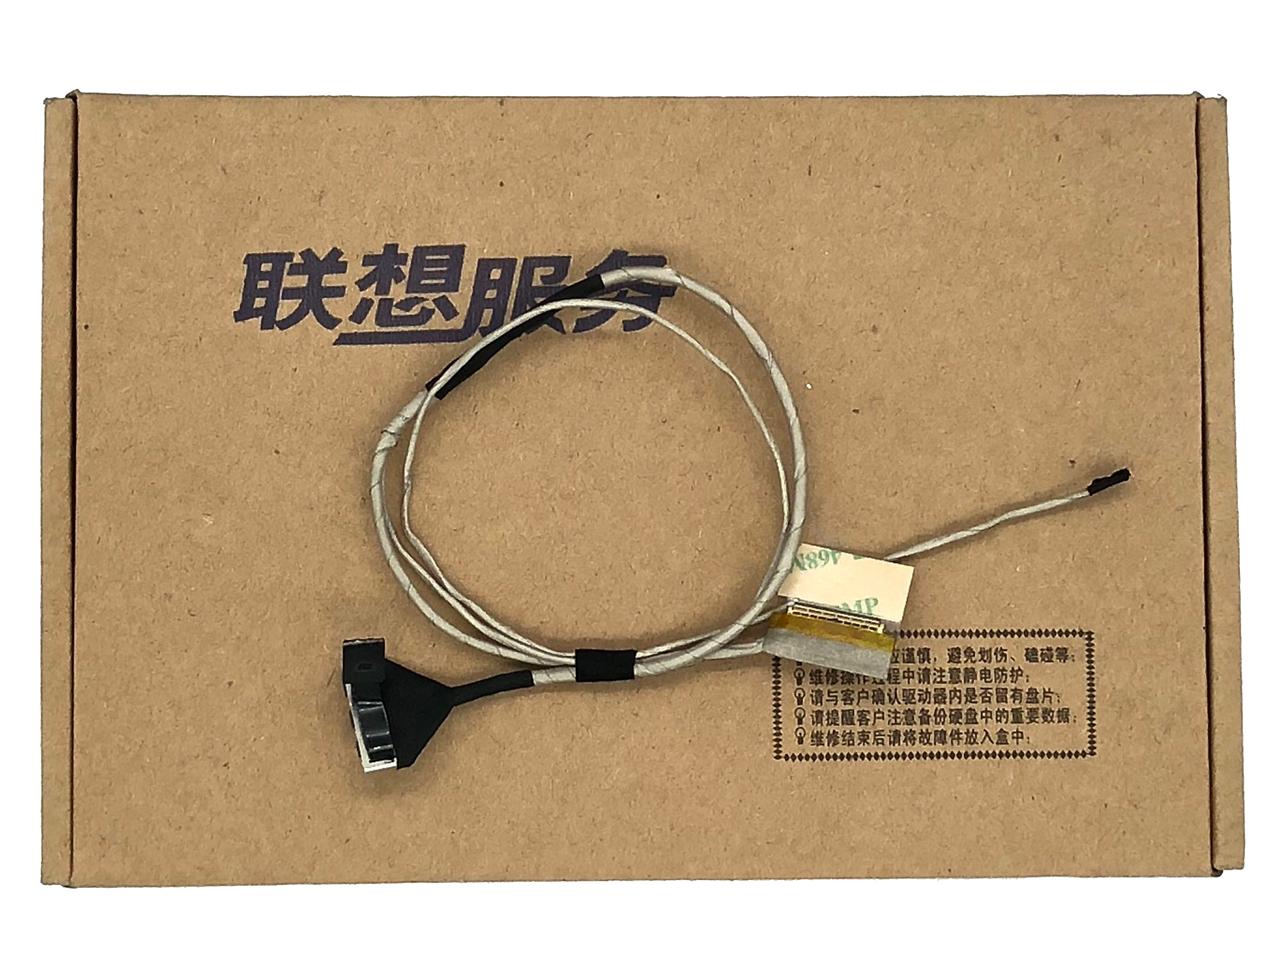 新到货248pcs DC02001M600 联想 Lenovo IdeaPad G40-30 G40-45 G40-70 LCD VIDEO CABLE 屏线 排线